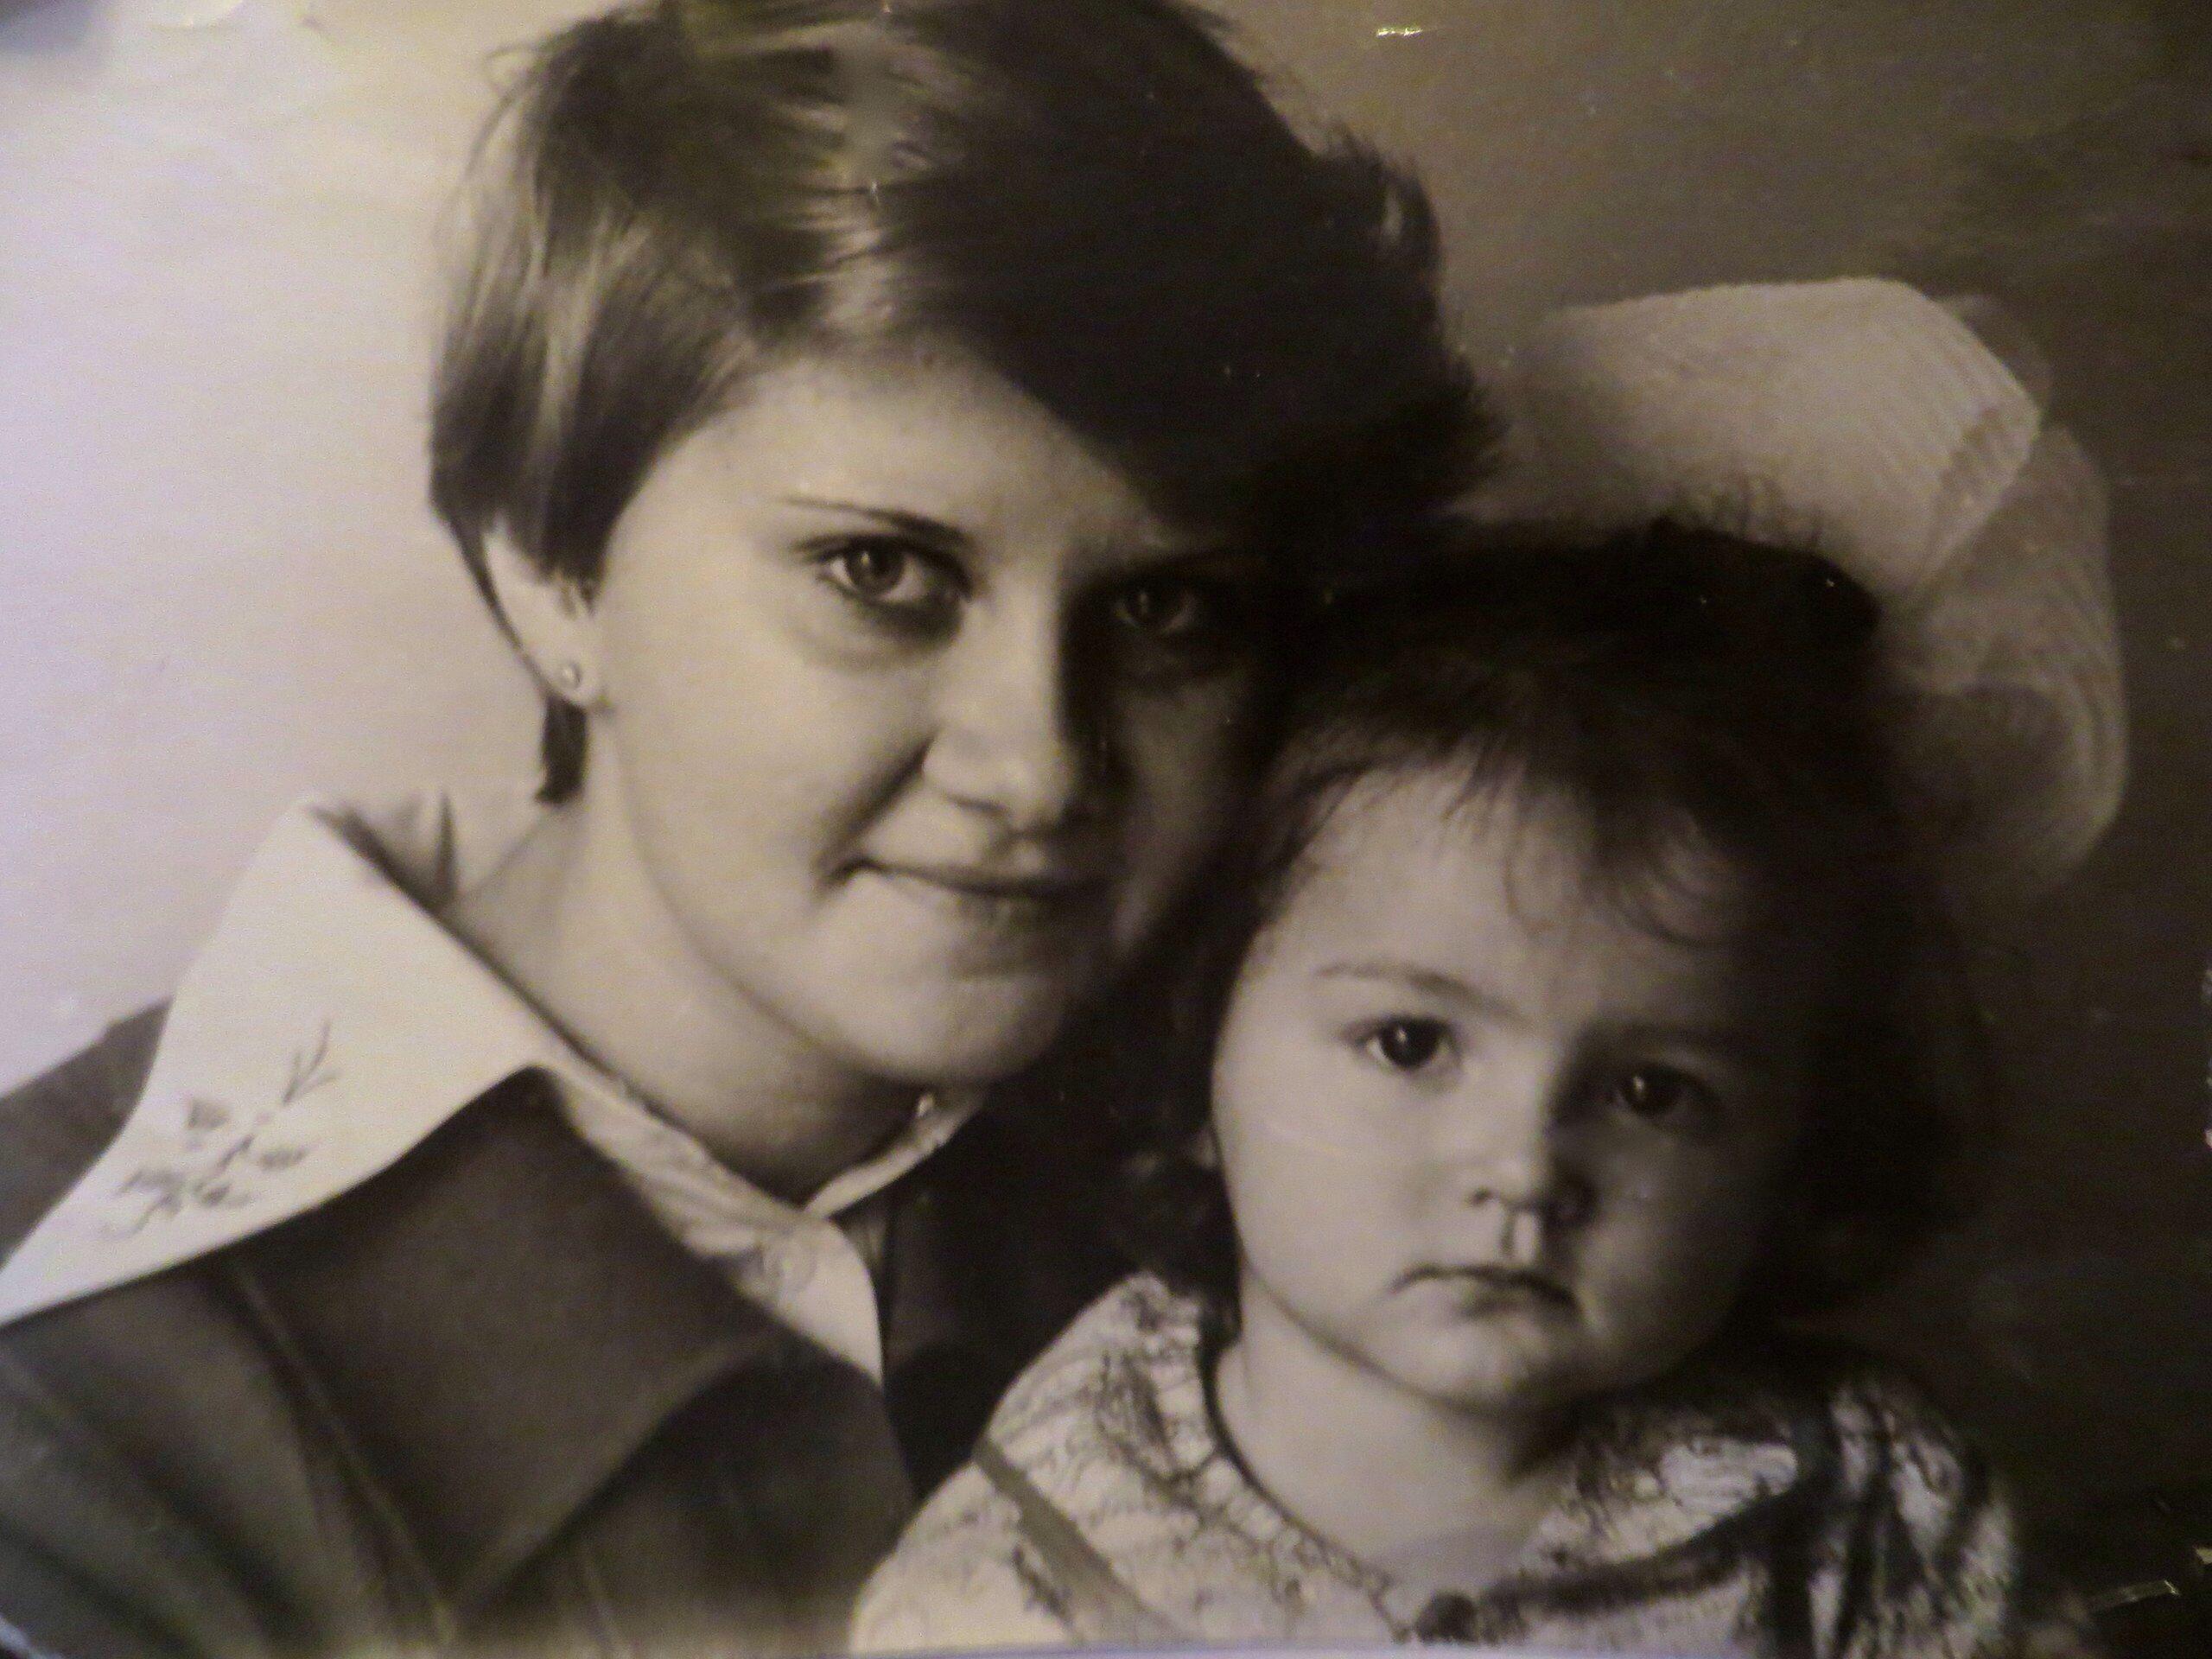 Me with Olga